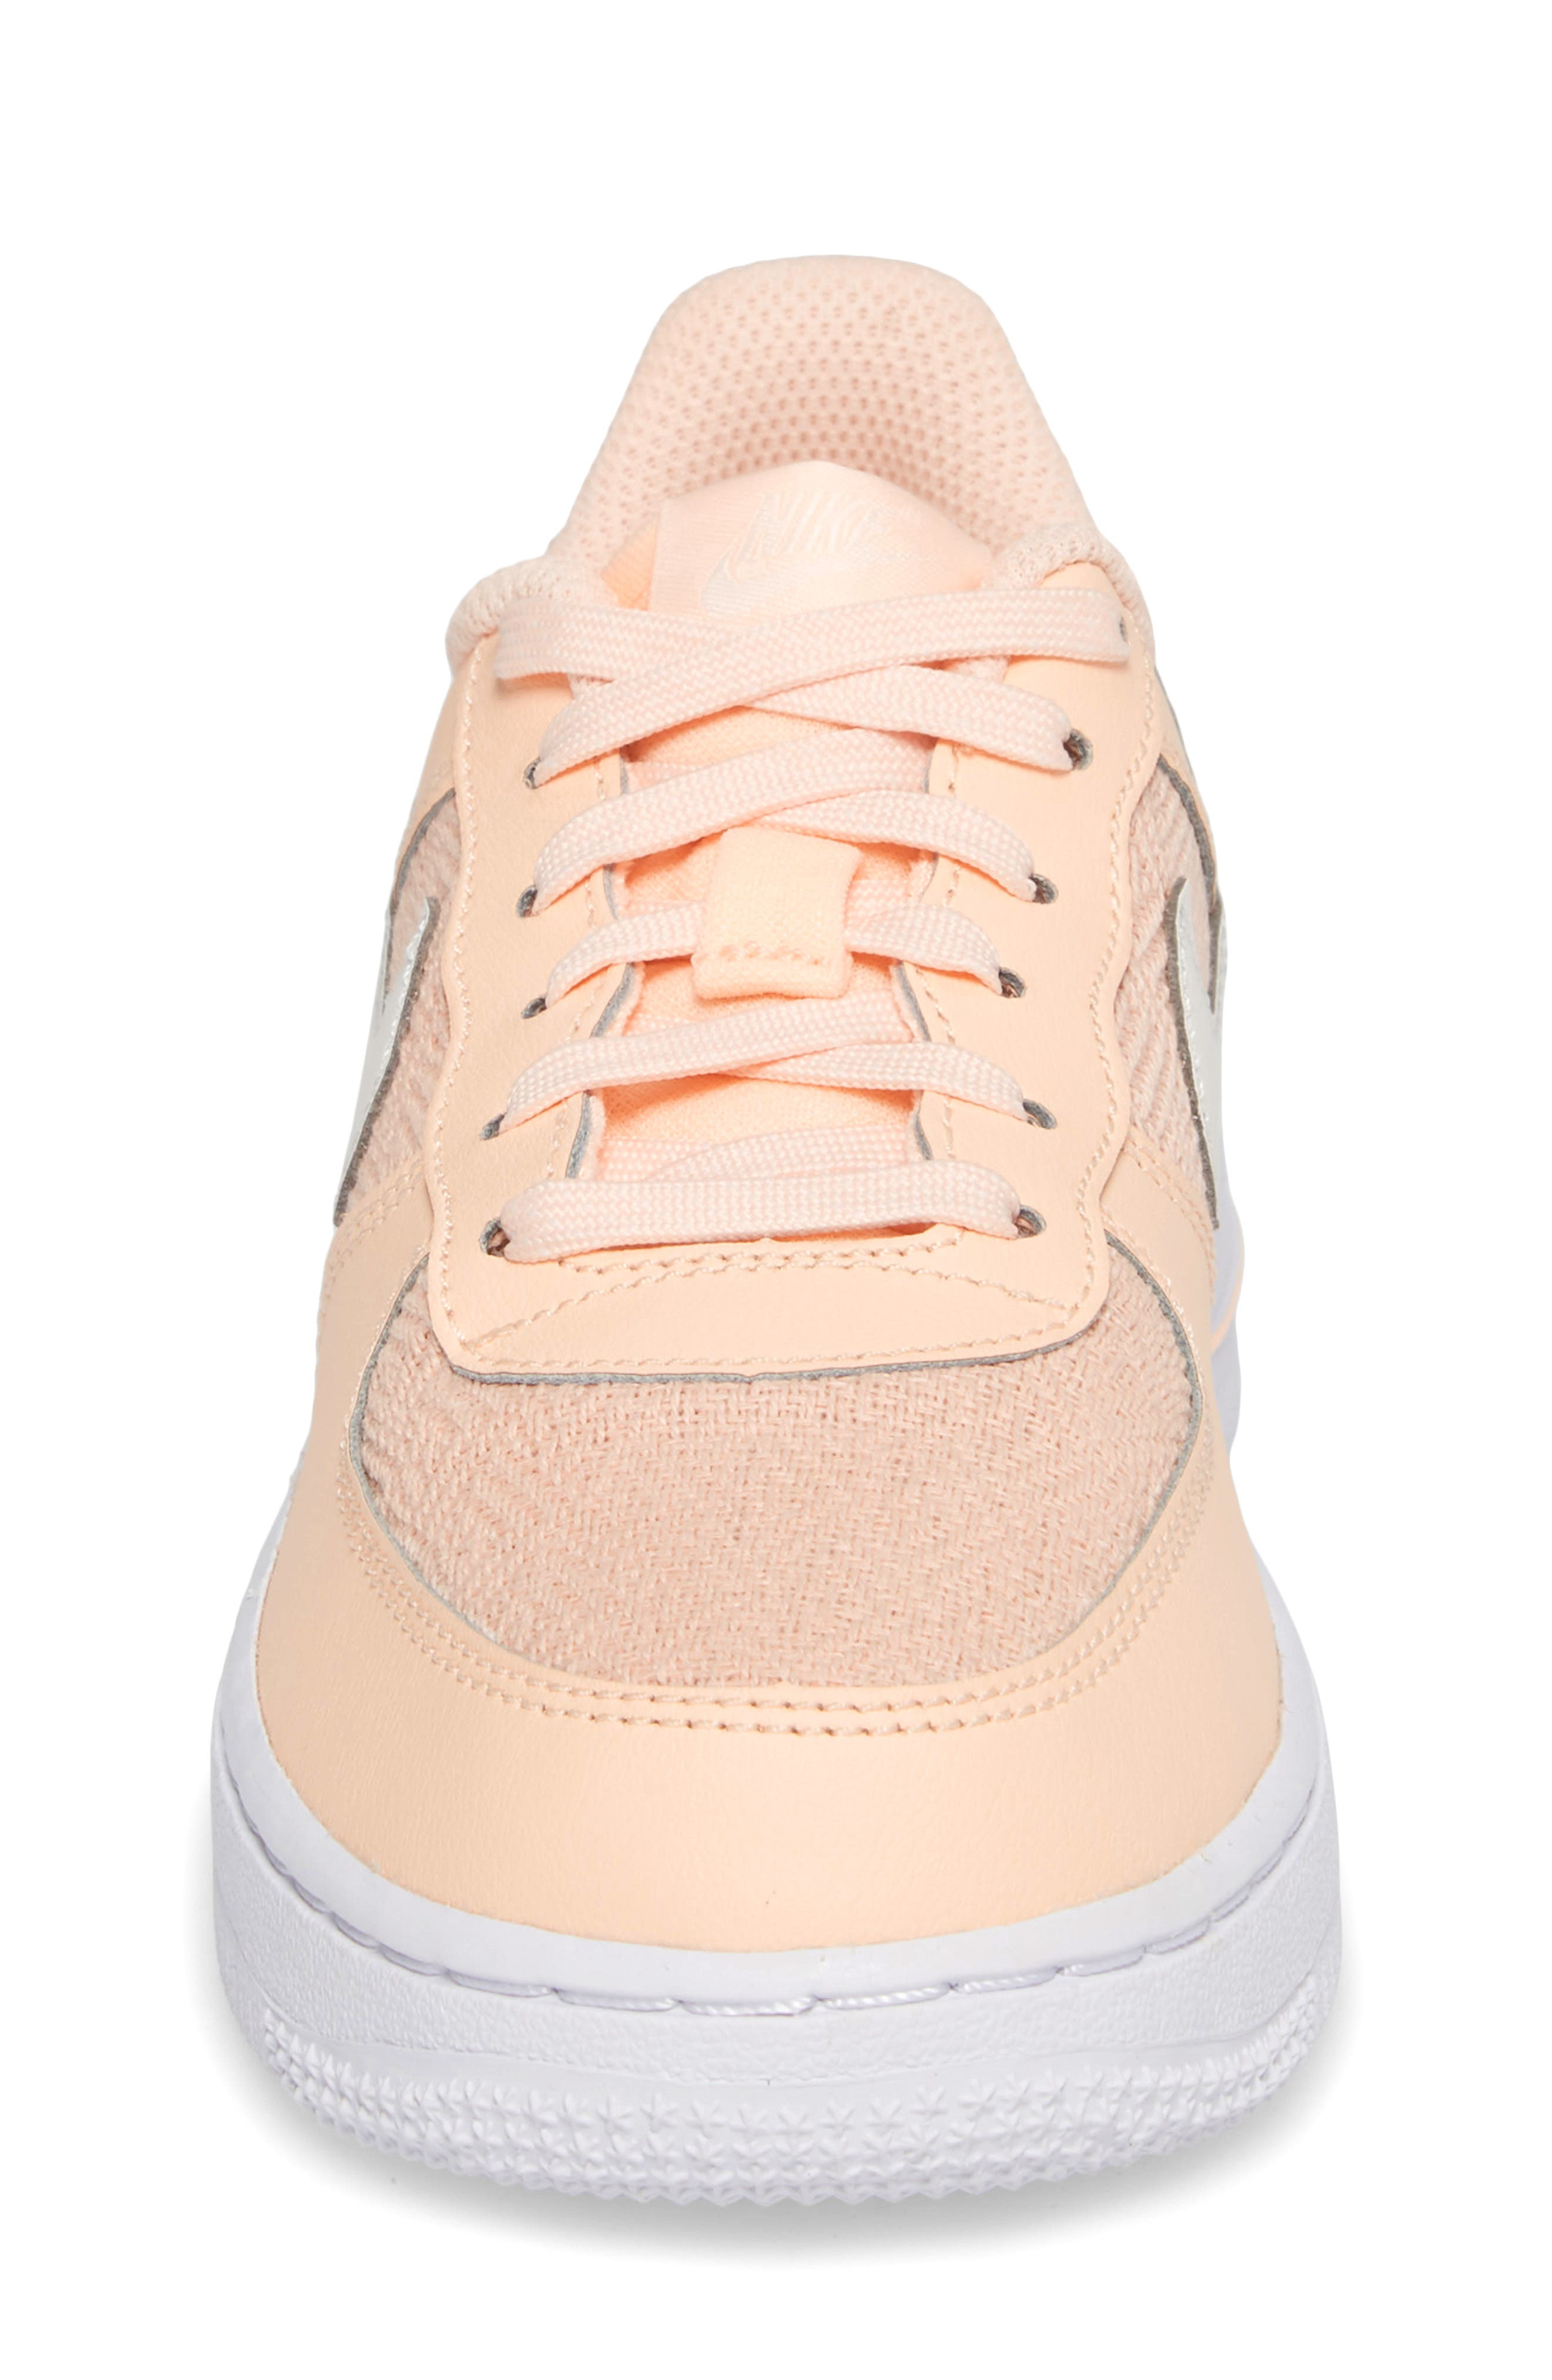 Air Force 1 LV8 Sneaker,                             Alternate thumbnail 4, color,                             Crimson Tint/ Sail/ White